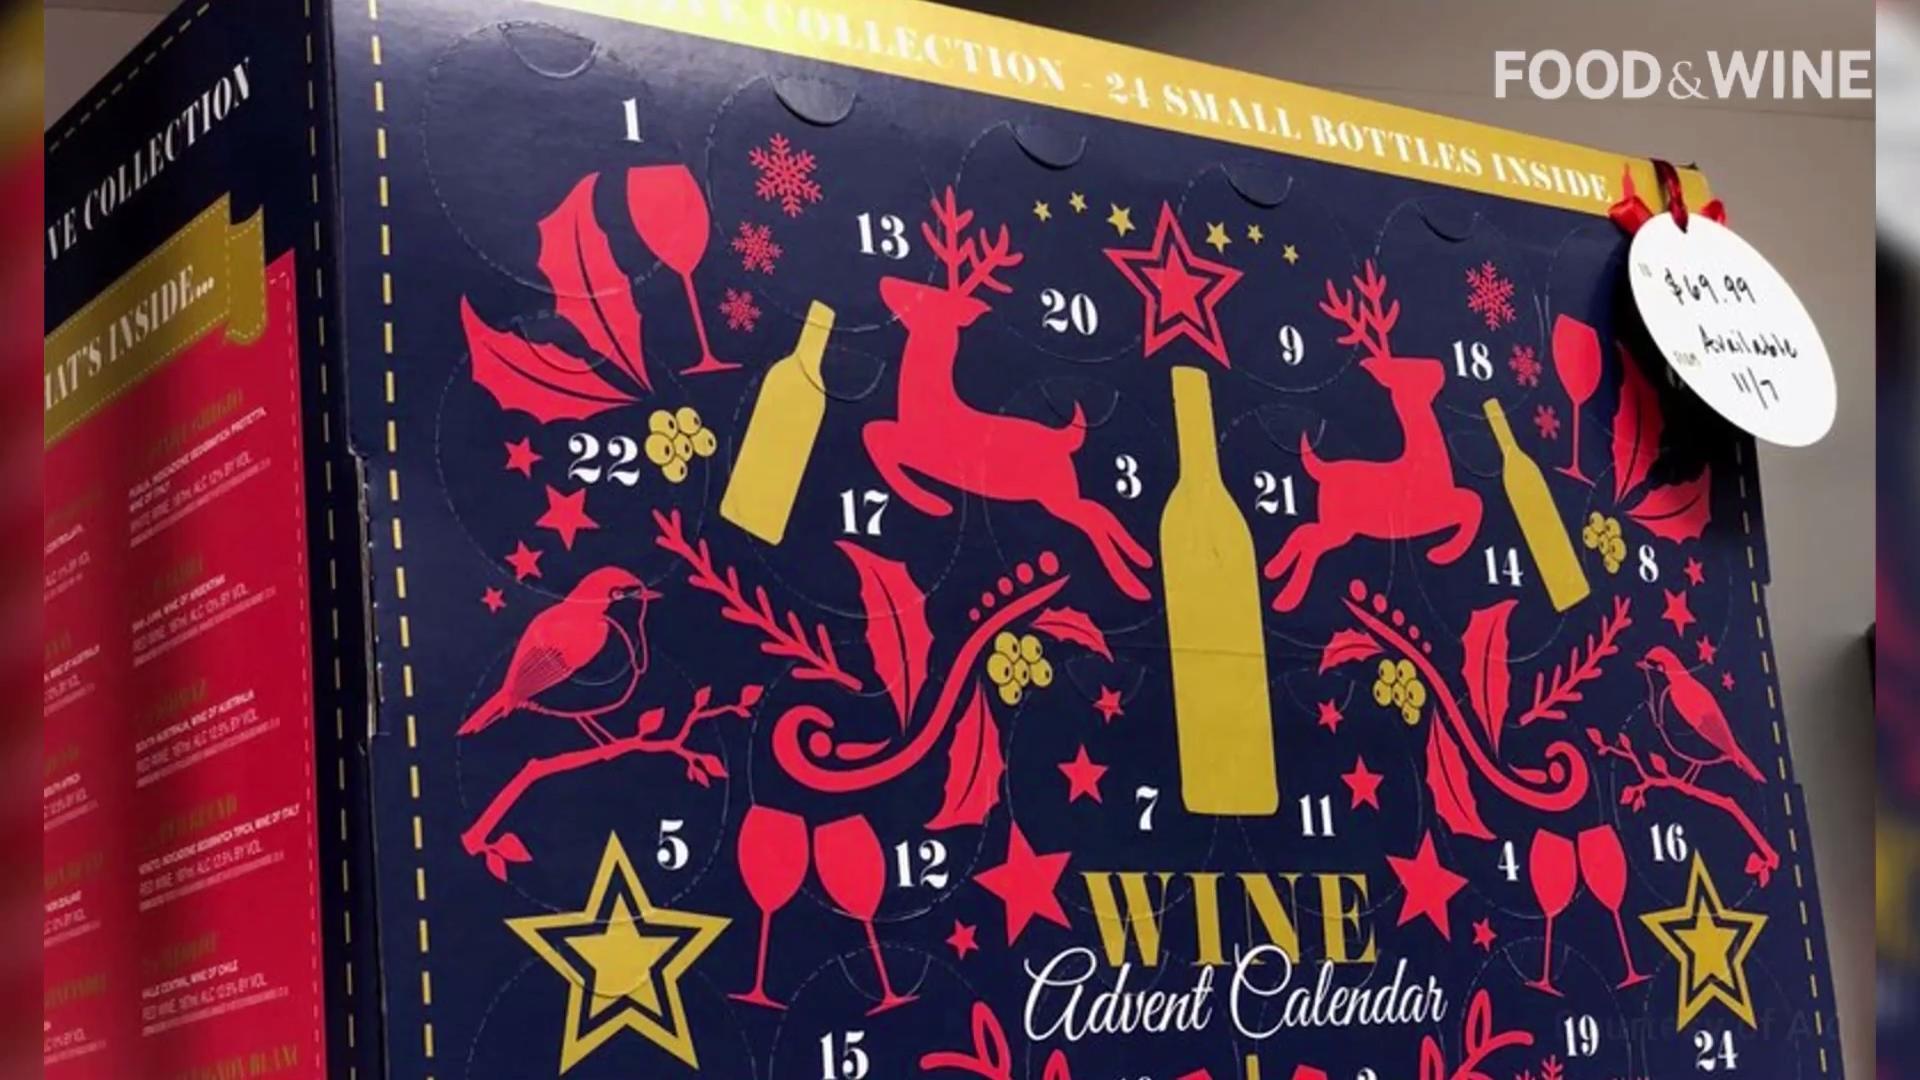 Aldi's Wine Advent Calendar Is Finally Coming to the U.S.